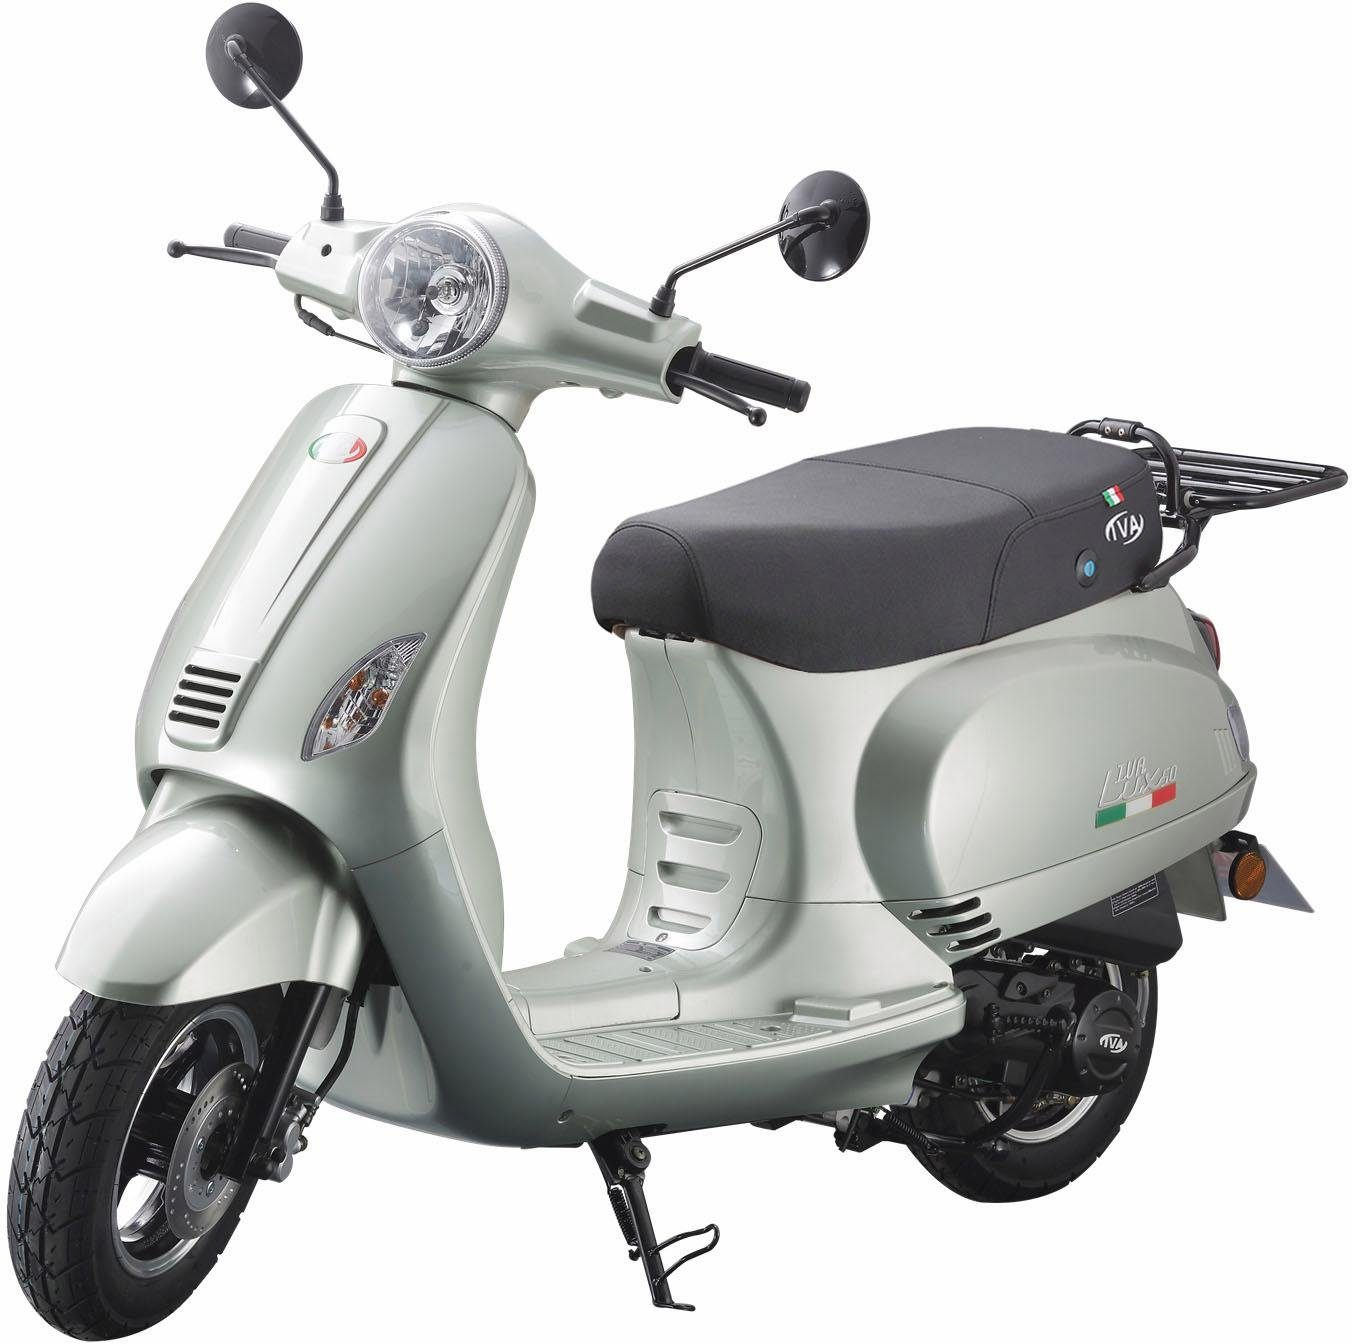 IVA Mofaroller »LUX«, 50 ccm, 25 km/h, 49 ccm, 3 PS, 25 km/h, für 1 Person